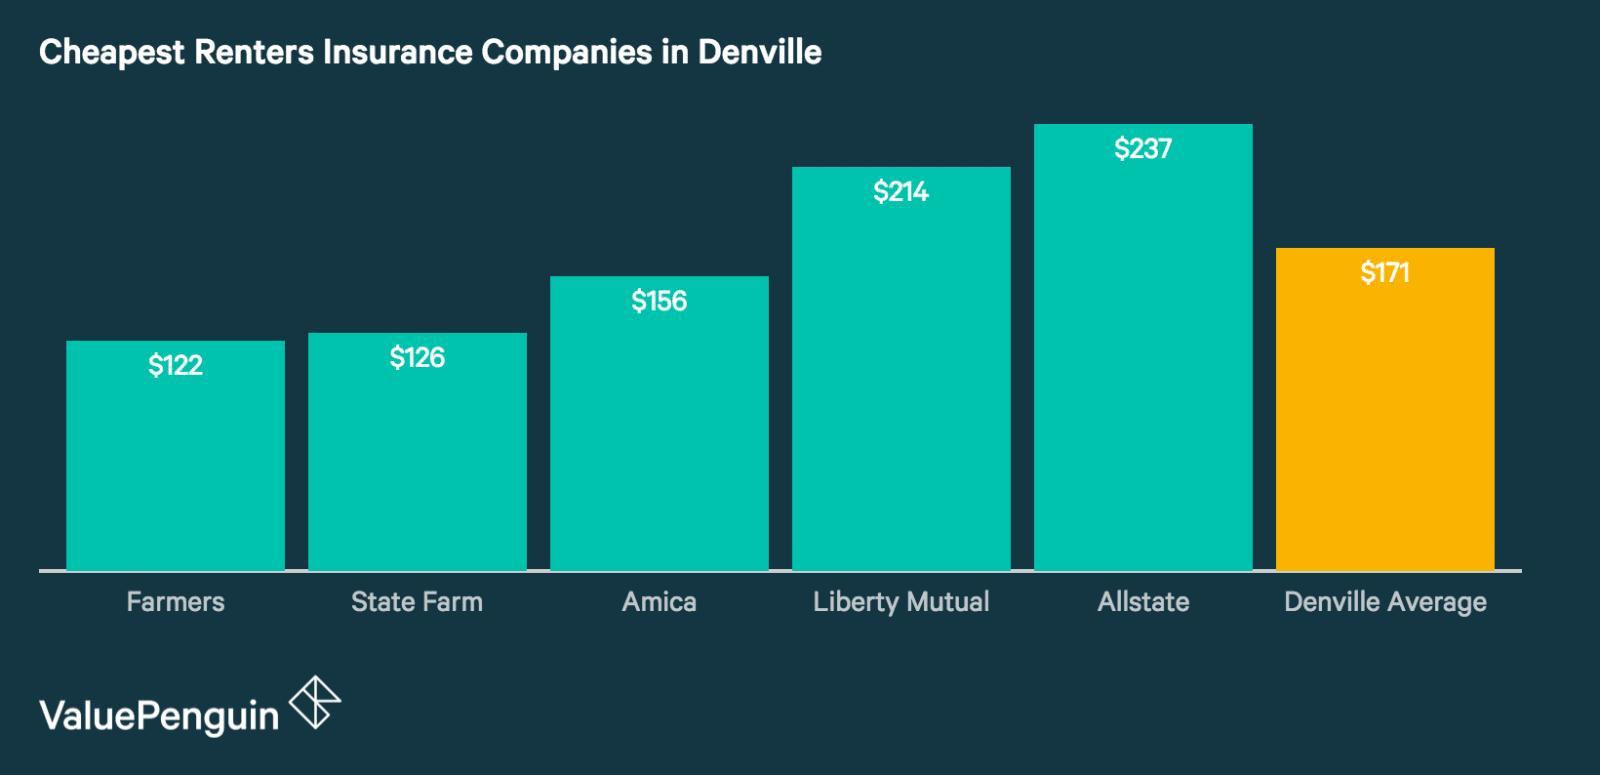 Best Renters Insurance Companies in Denville